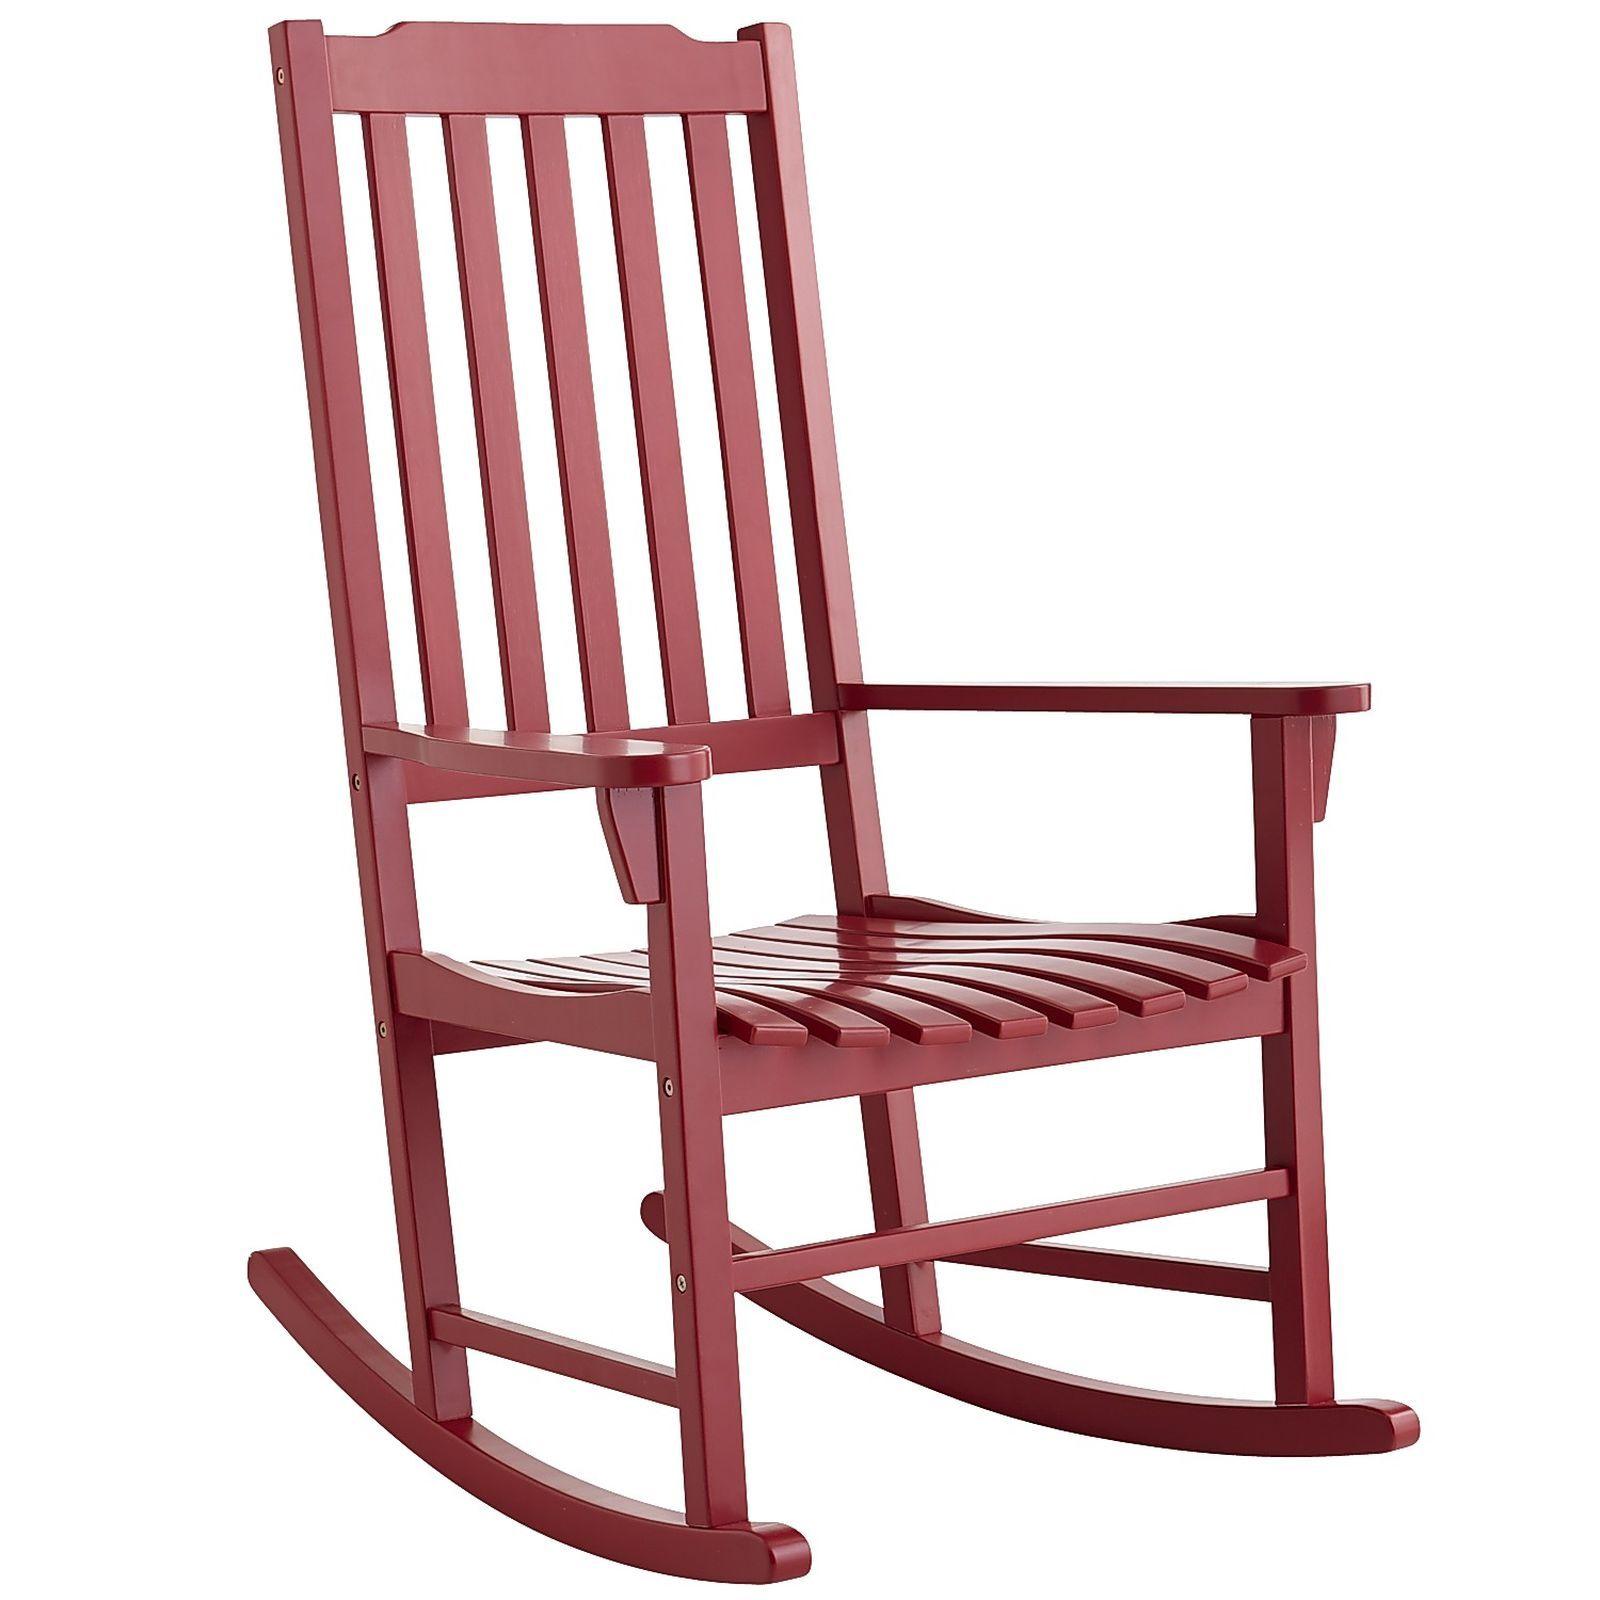 Rock Point Rocker Red Outdoor Rocking Chairs Rocking Chair Porch Rocker